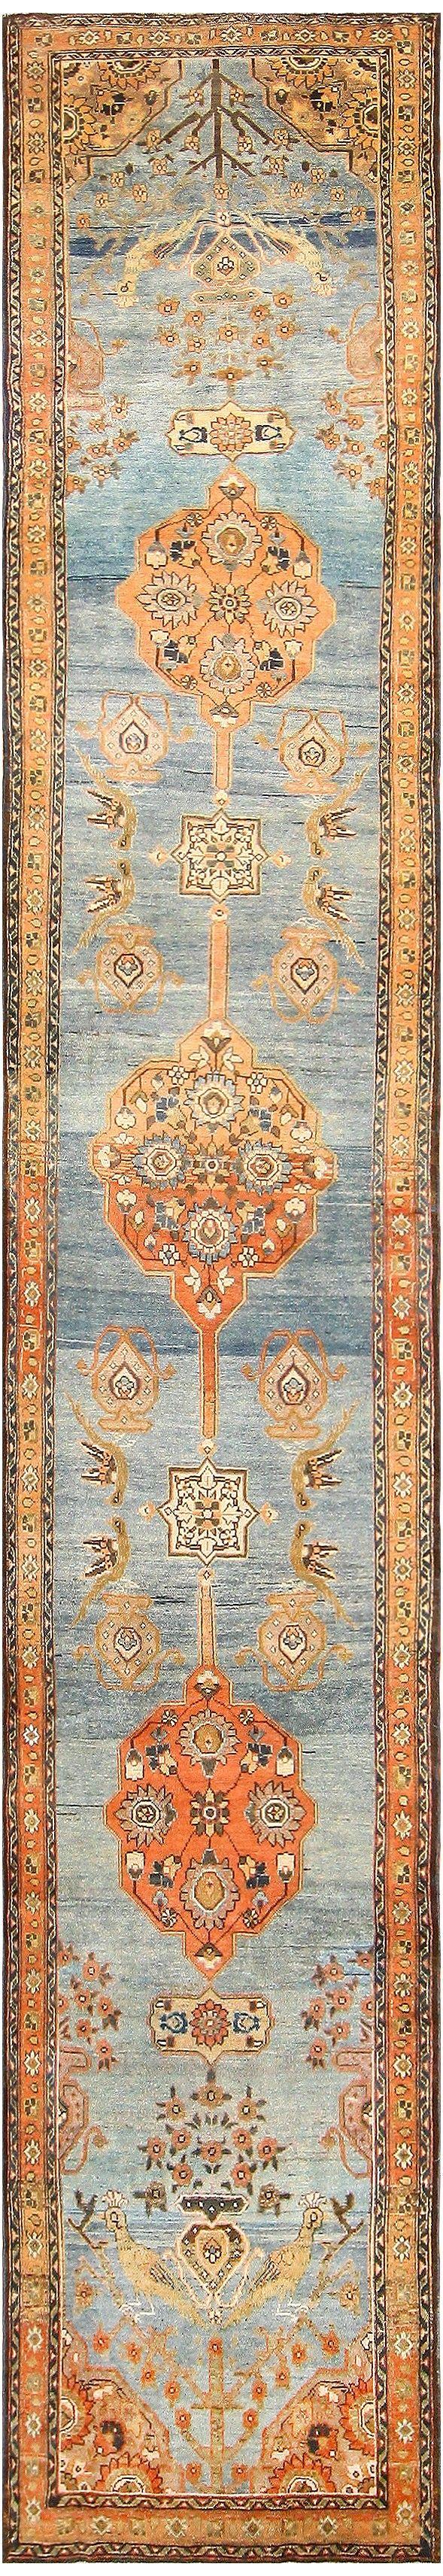 Antique Persian Malayer Runner 47972 Main Image - By Nazmiyal. Beautiful Persian carpet